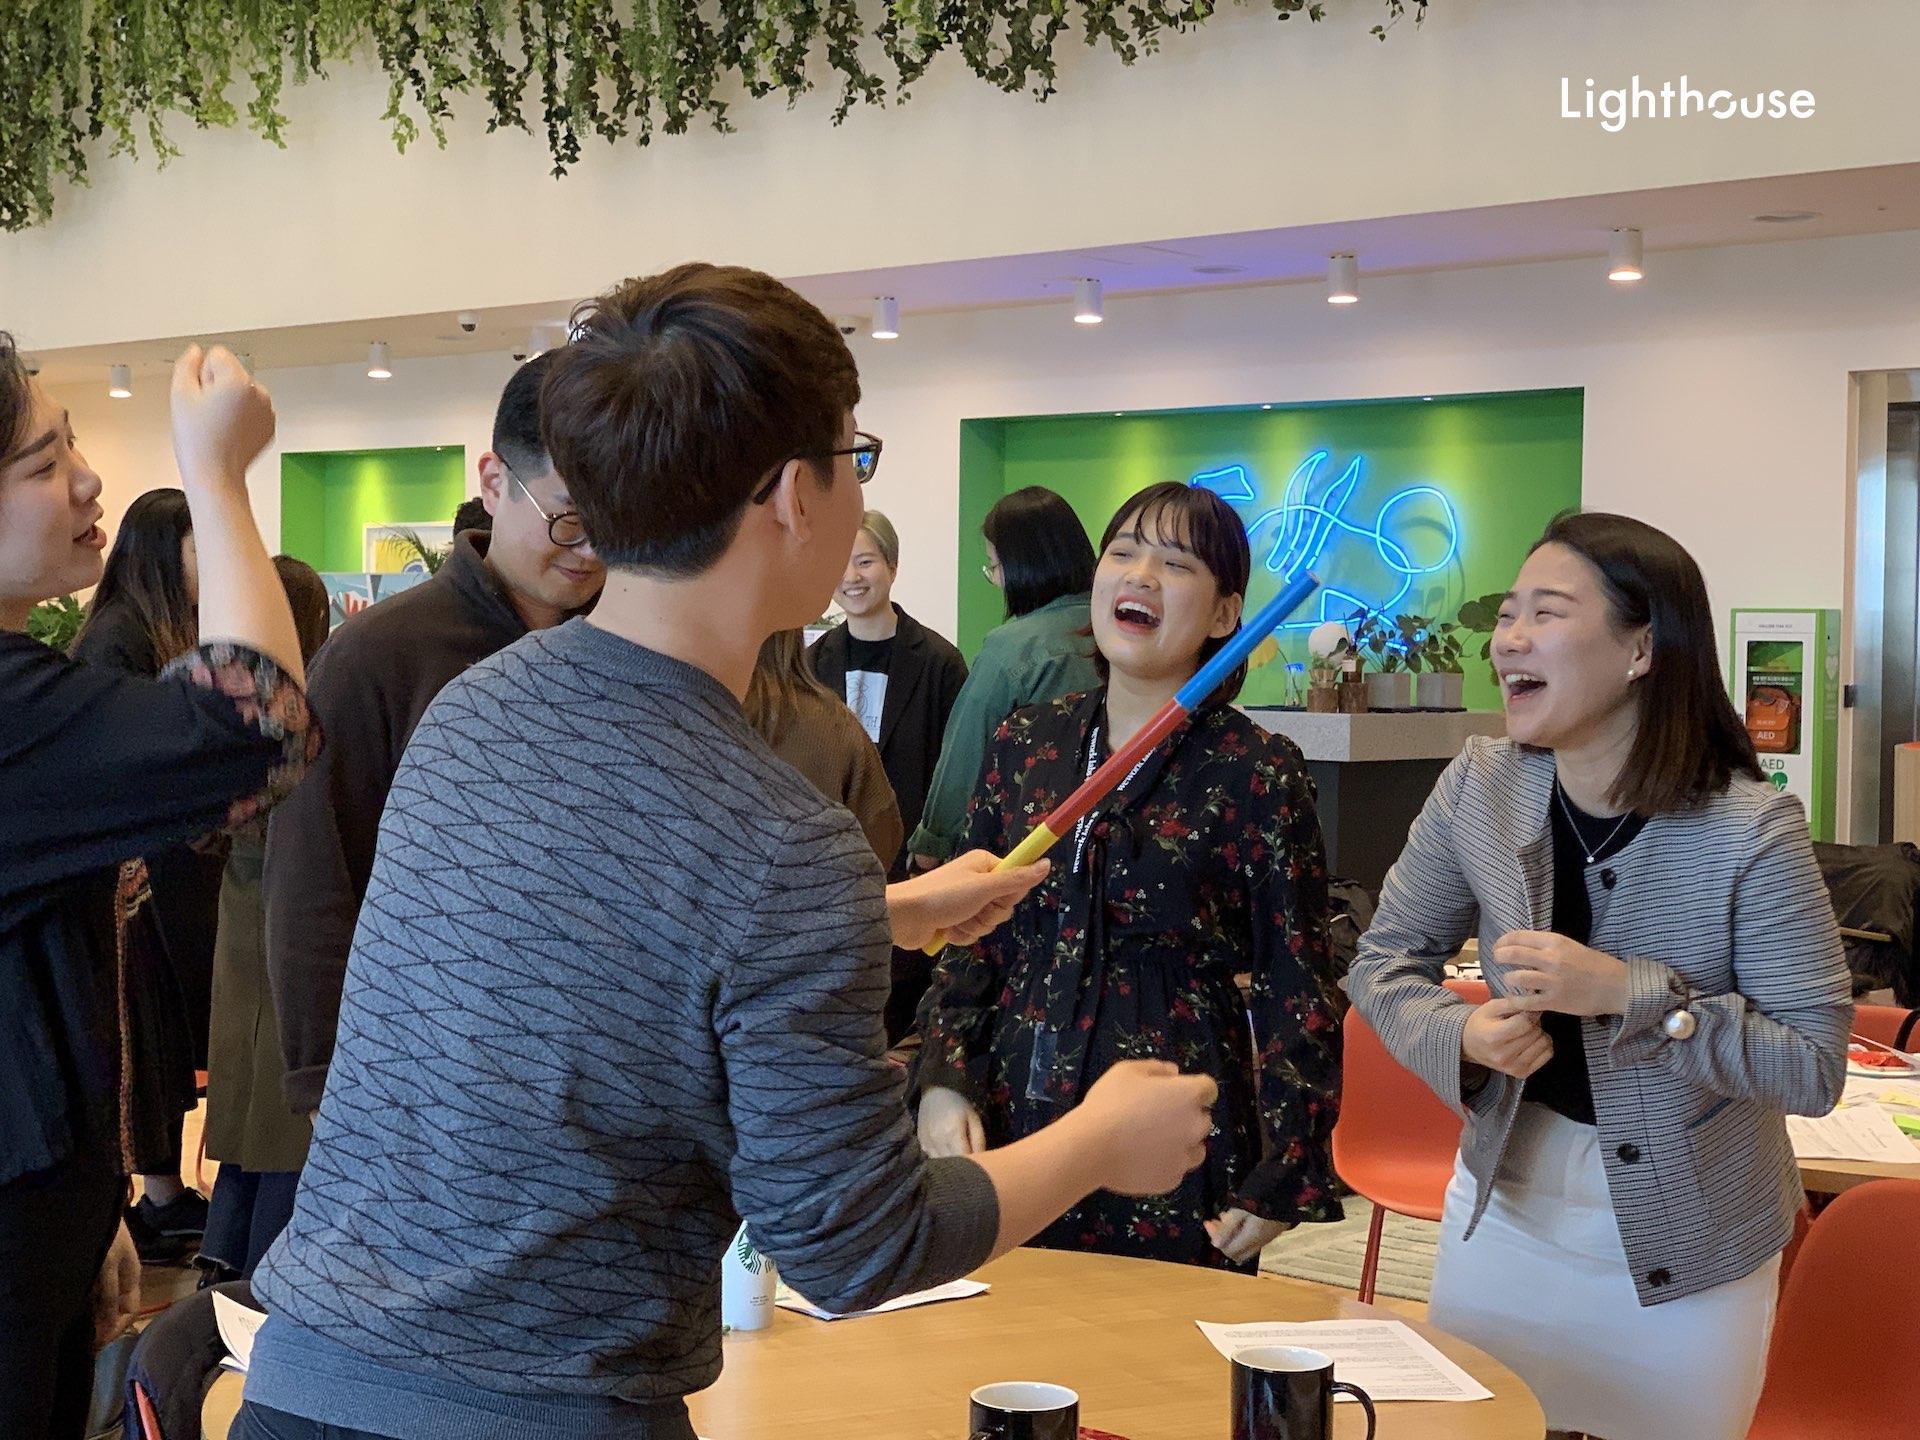 Lighthouse Workshops Photos_Lighting Up Ventures Inc.007.jpeg